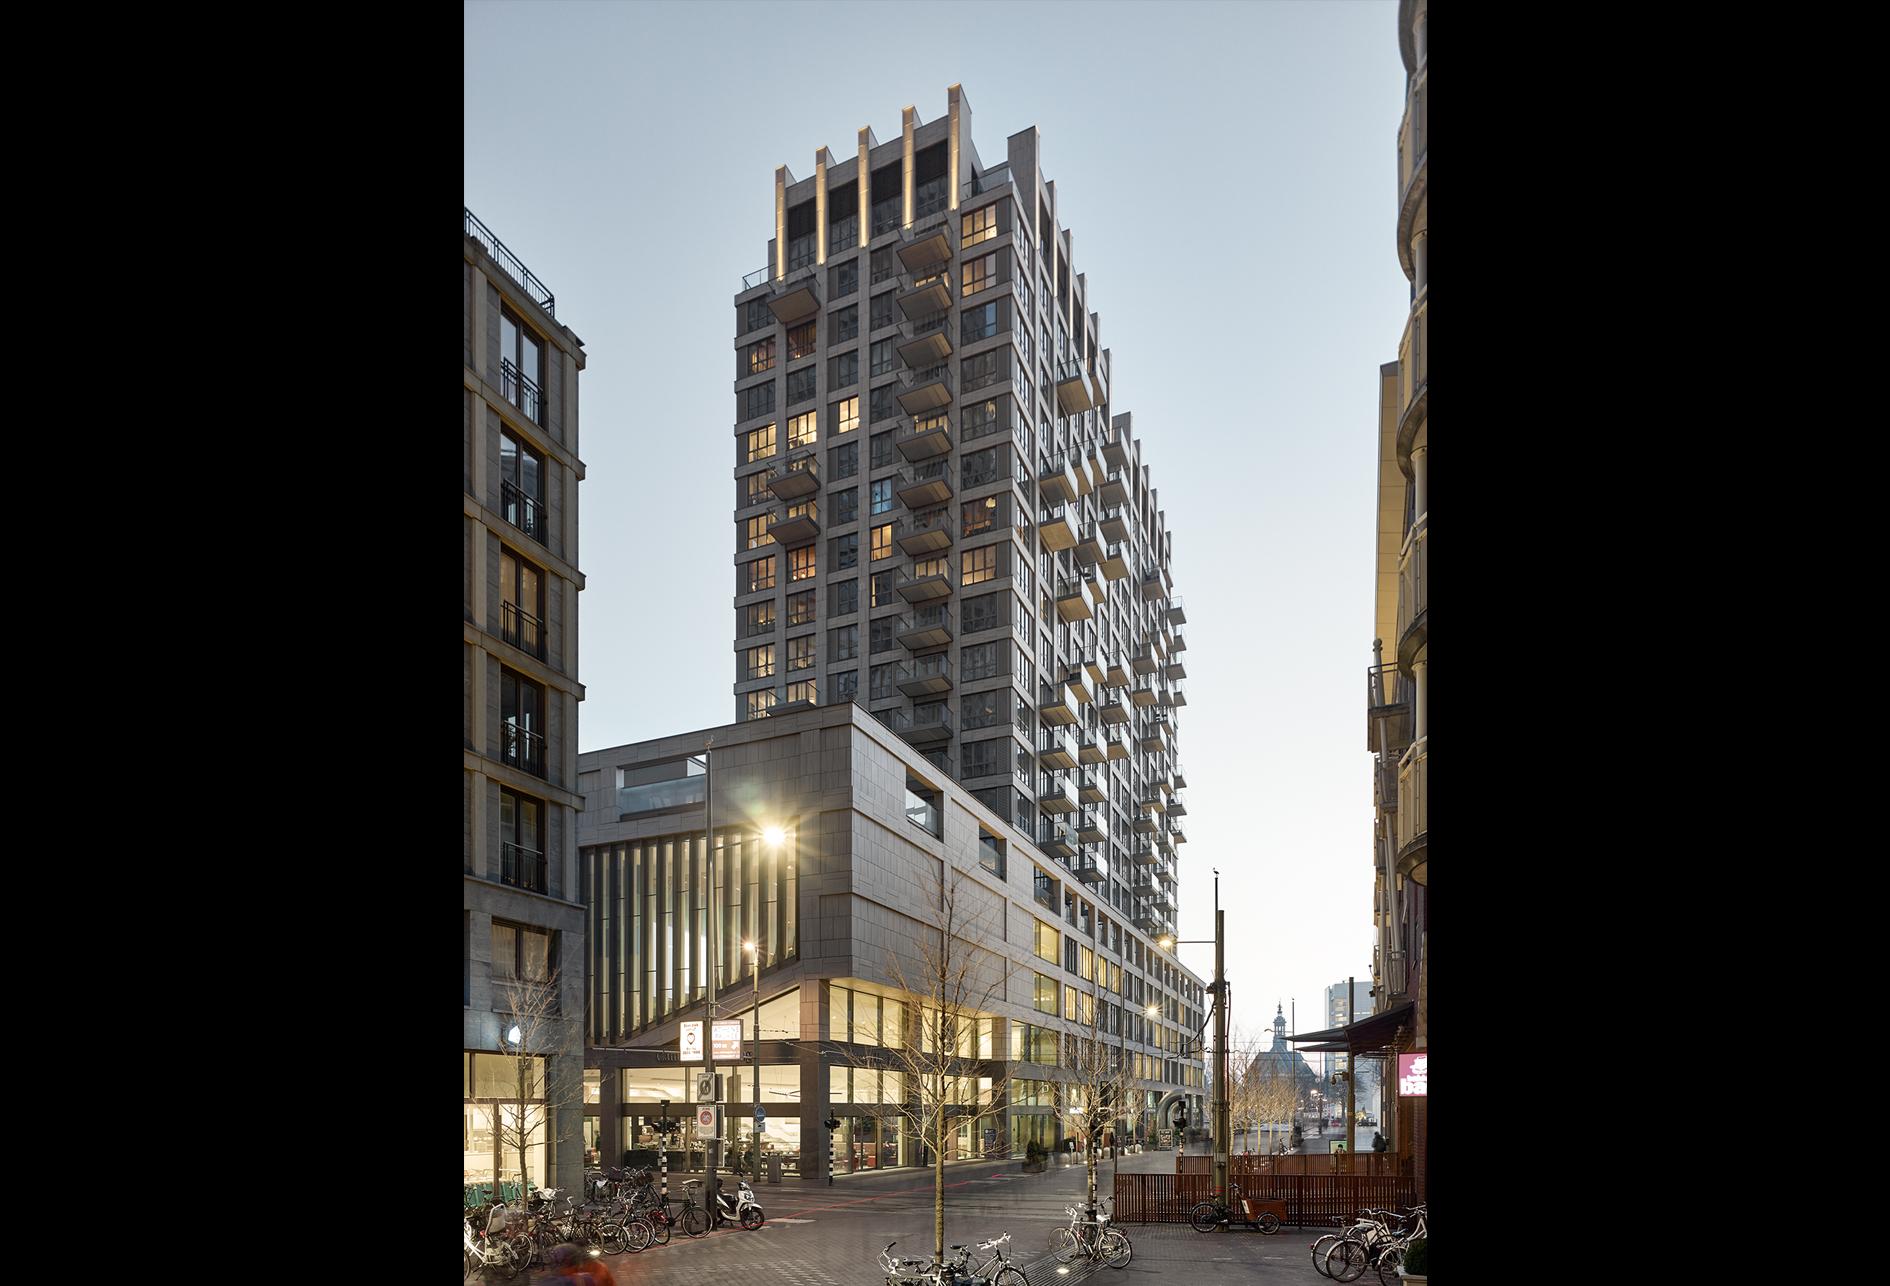 <p>hoek Lage Zand/Turfmarkt met entree Faculteit Campus Den Haag (foto: Stefan Müller)</p>